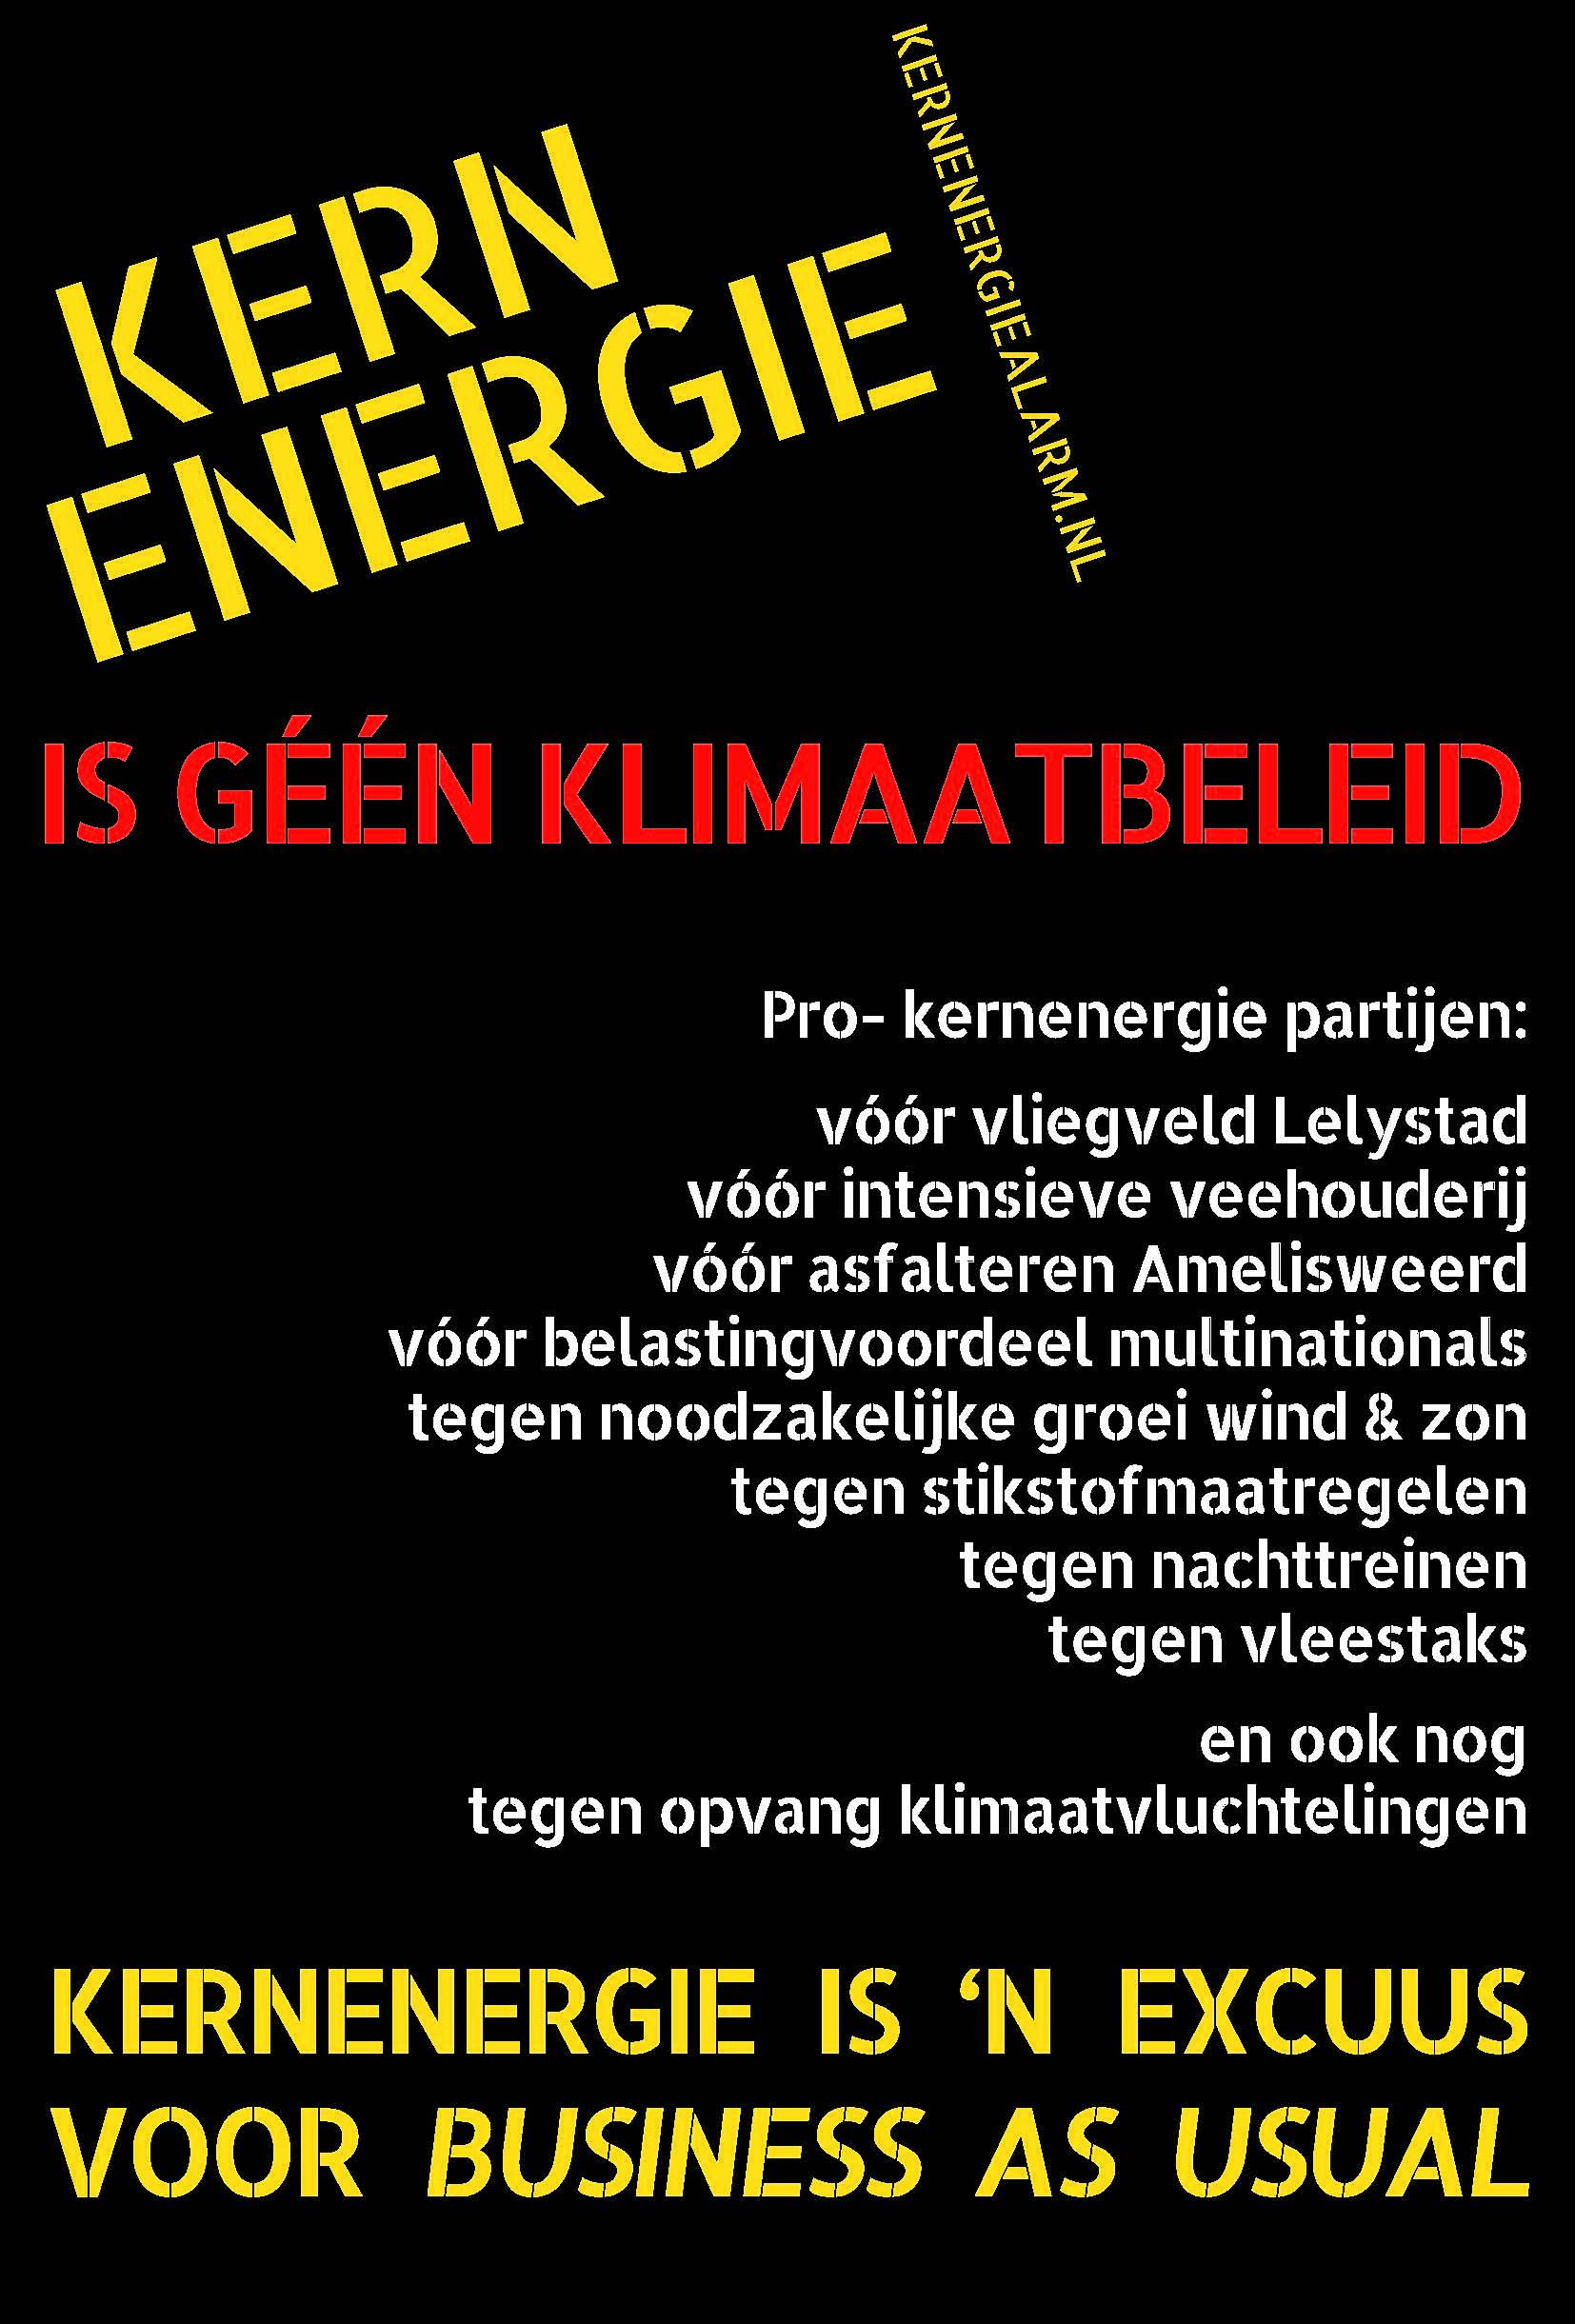 Kernenergie is geen klimaatbeleid